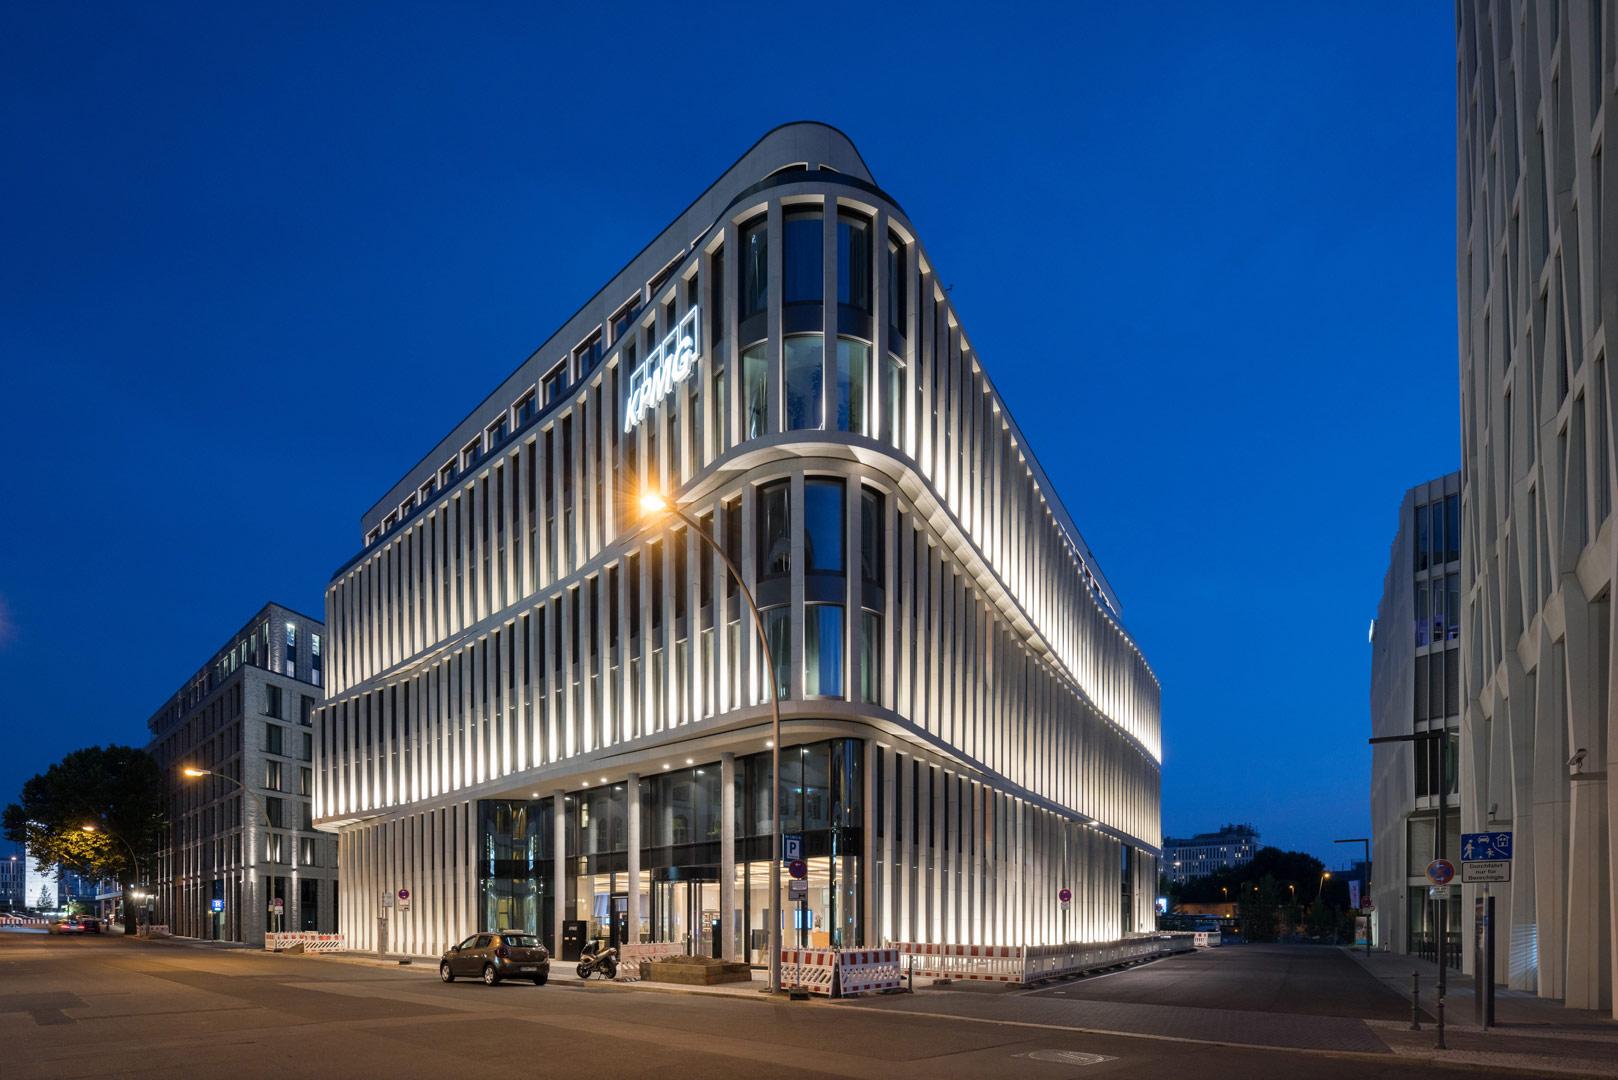 KPMG_Berlin_Kardorff_Ingenieure_Lichtplanung